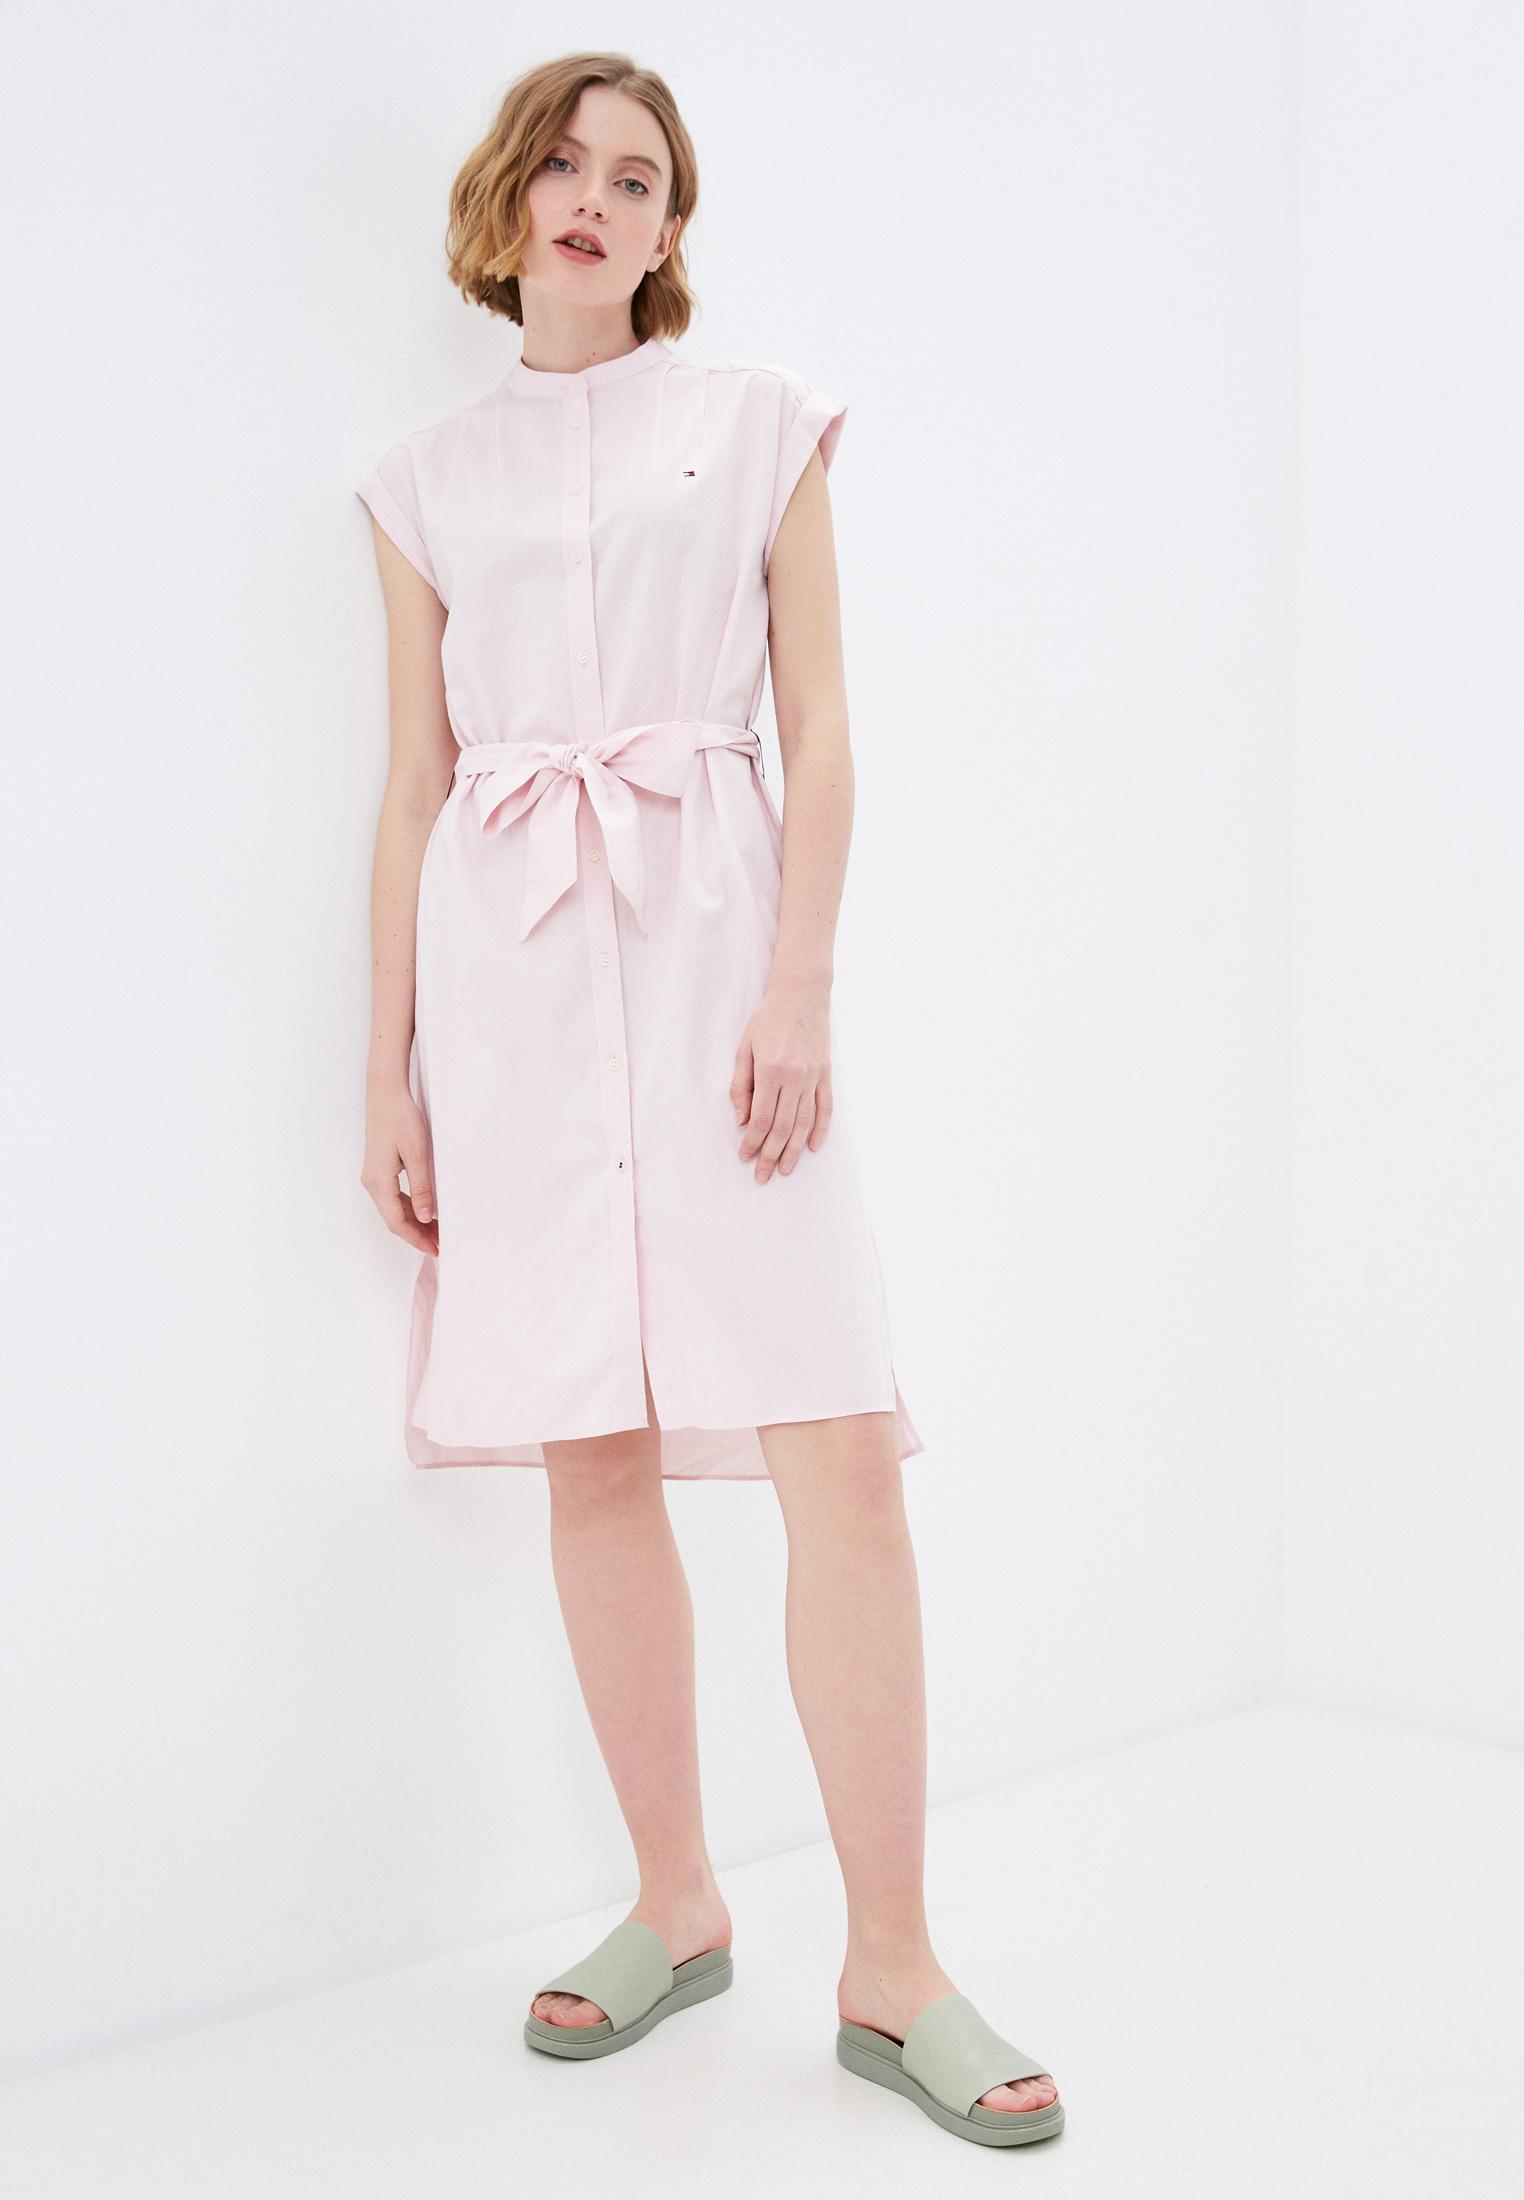 Платье Tommy Hilfiger (Томми Хилфигер) WW0WW30596: изображение 2